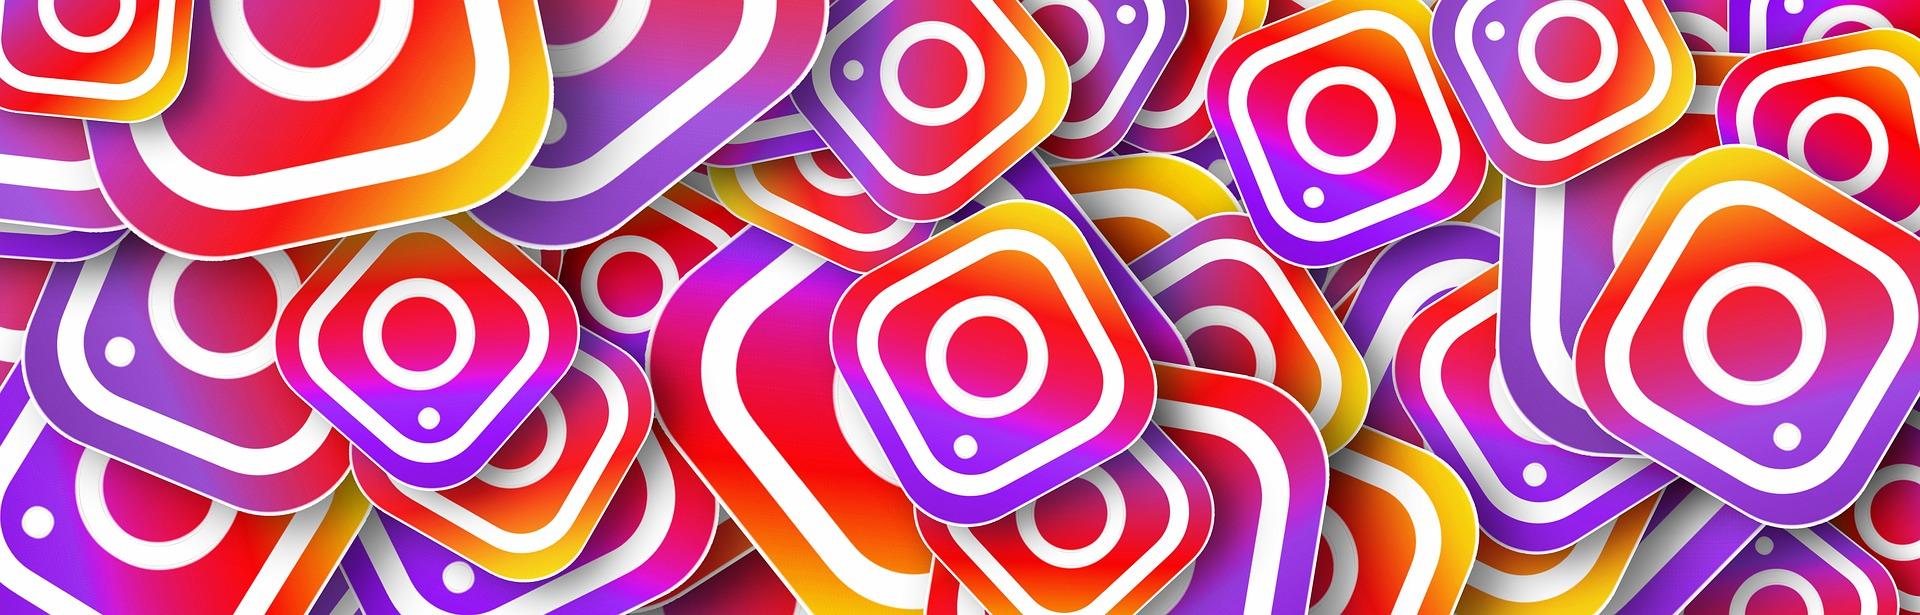 conta verificada no instagram